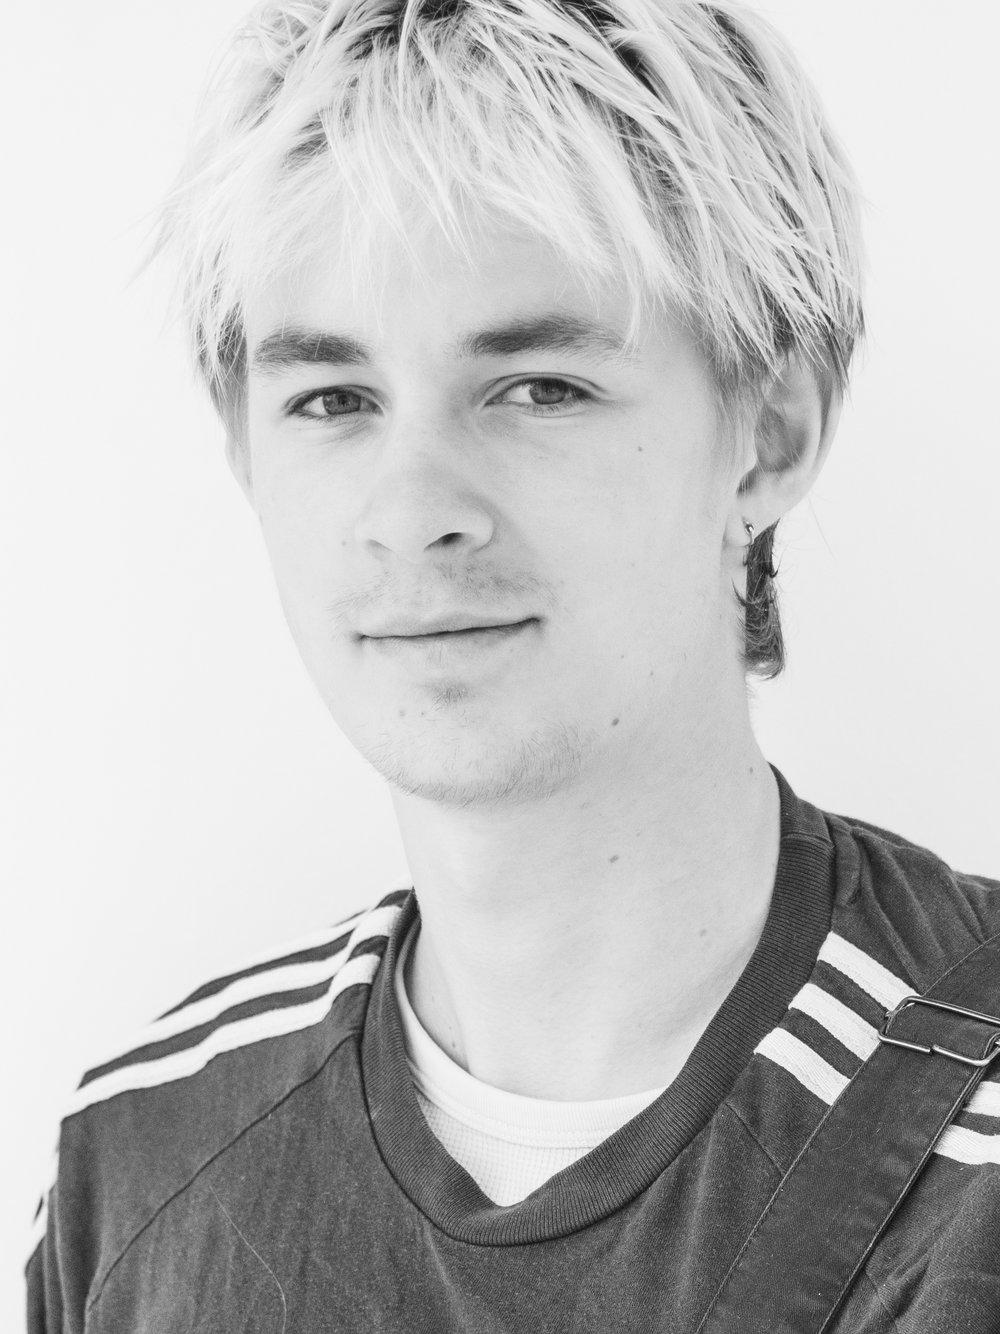 Emil001.jpg